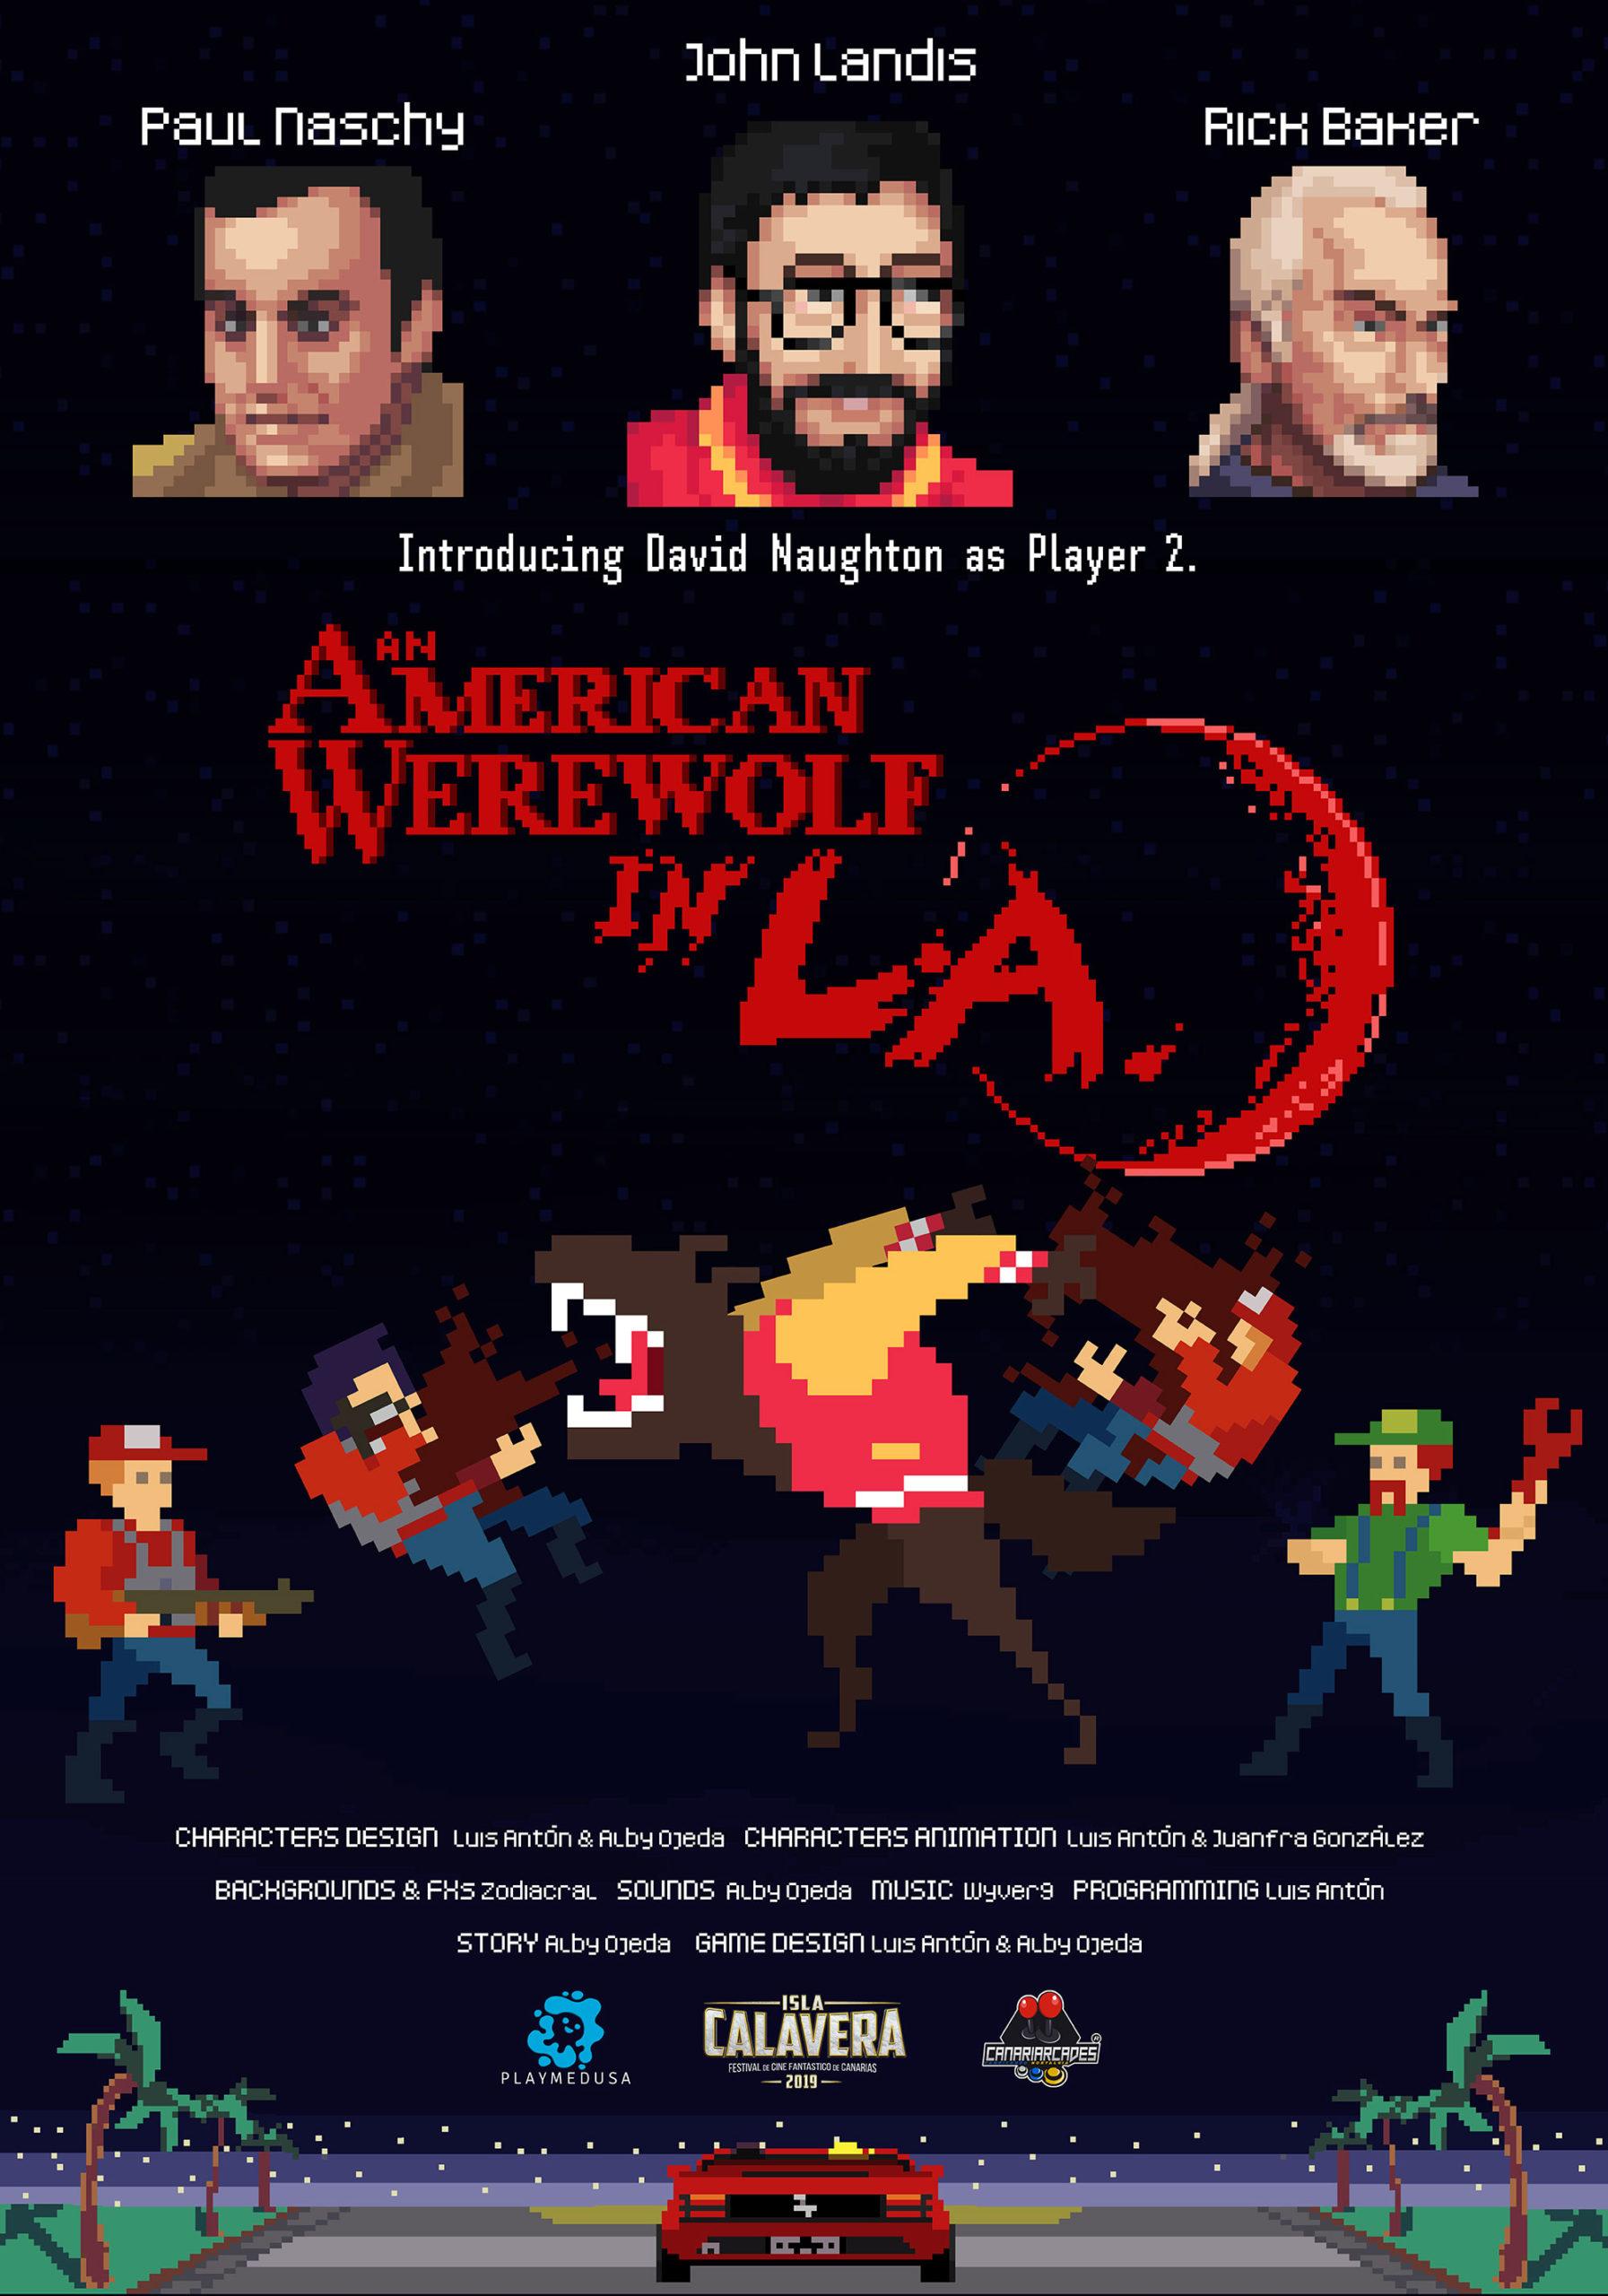 Cartel del videojuego 'An american werewolf in L.A.'